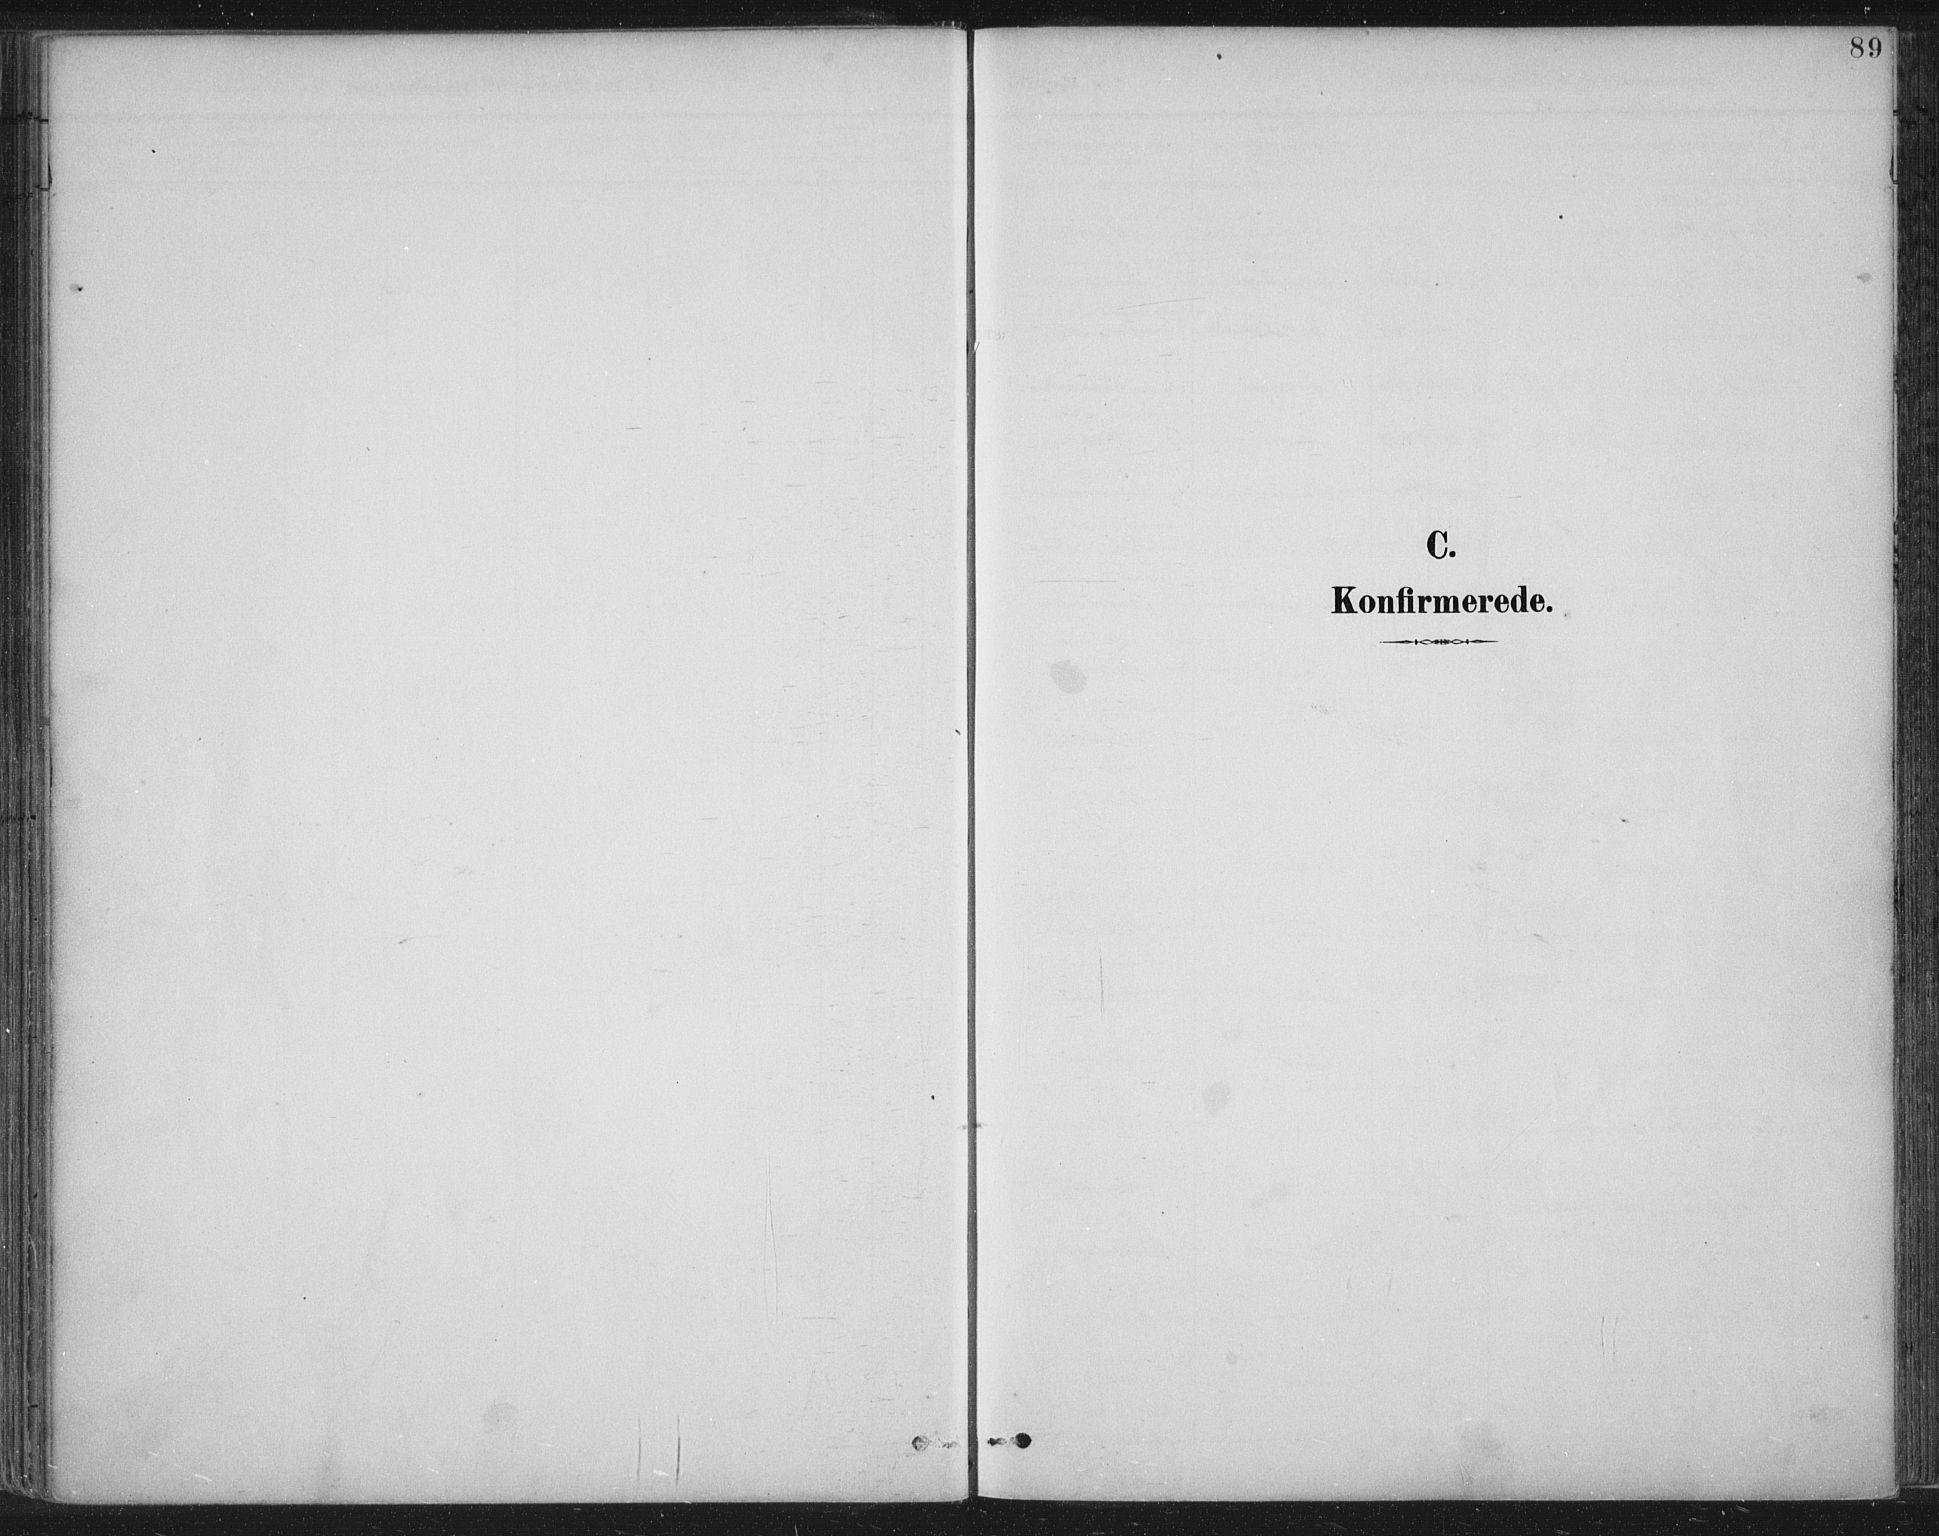 SAST, Tysvær sokneprestkontor, H/Ha/Haa/L0008: Ministerialbok nr. A 8, 1897-1918, s. 89